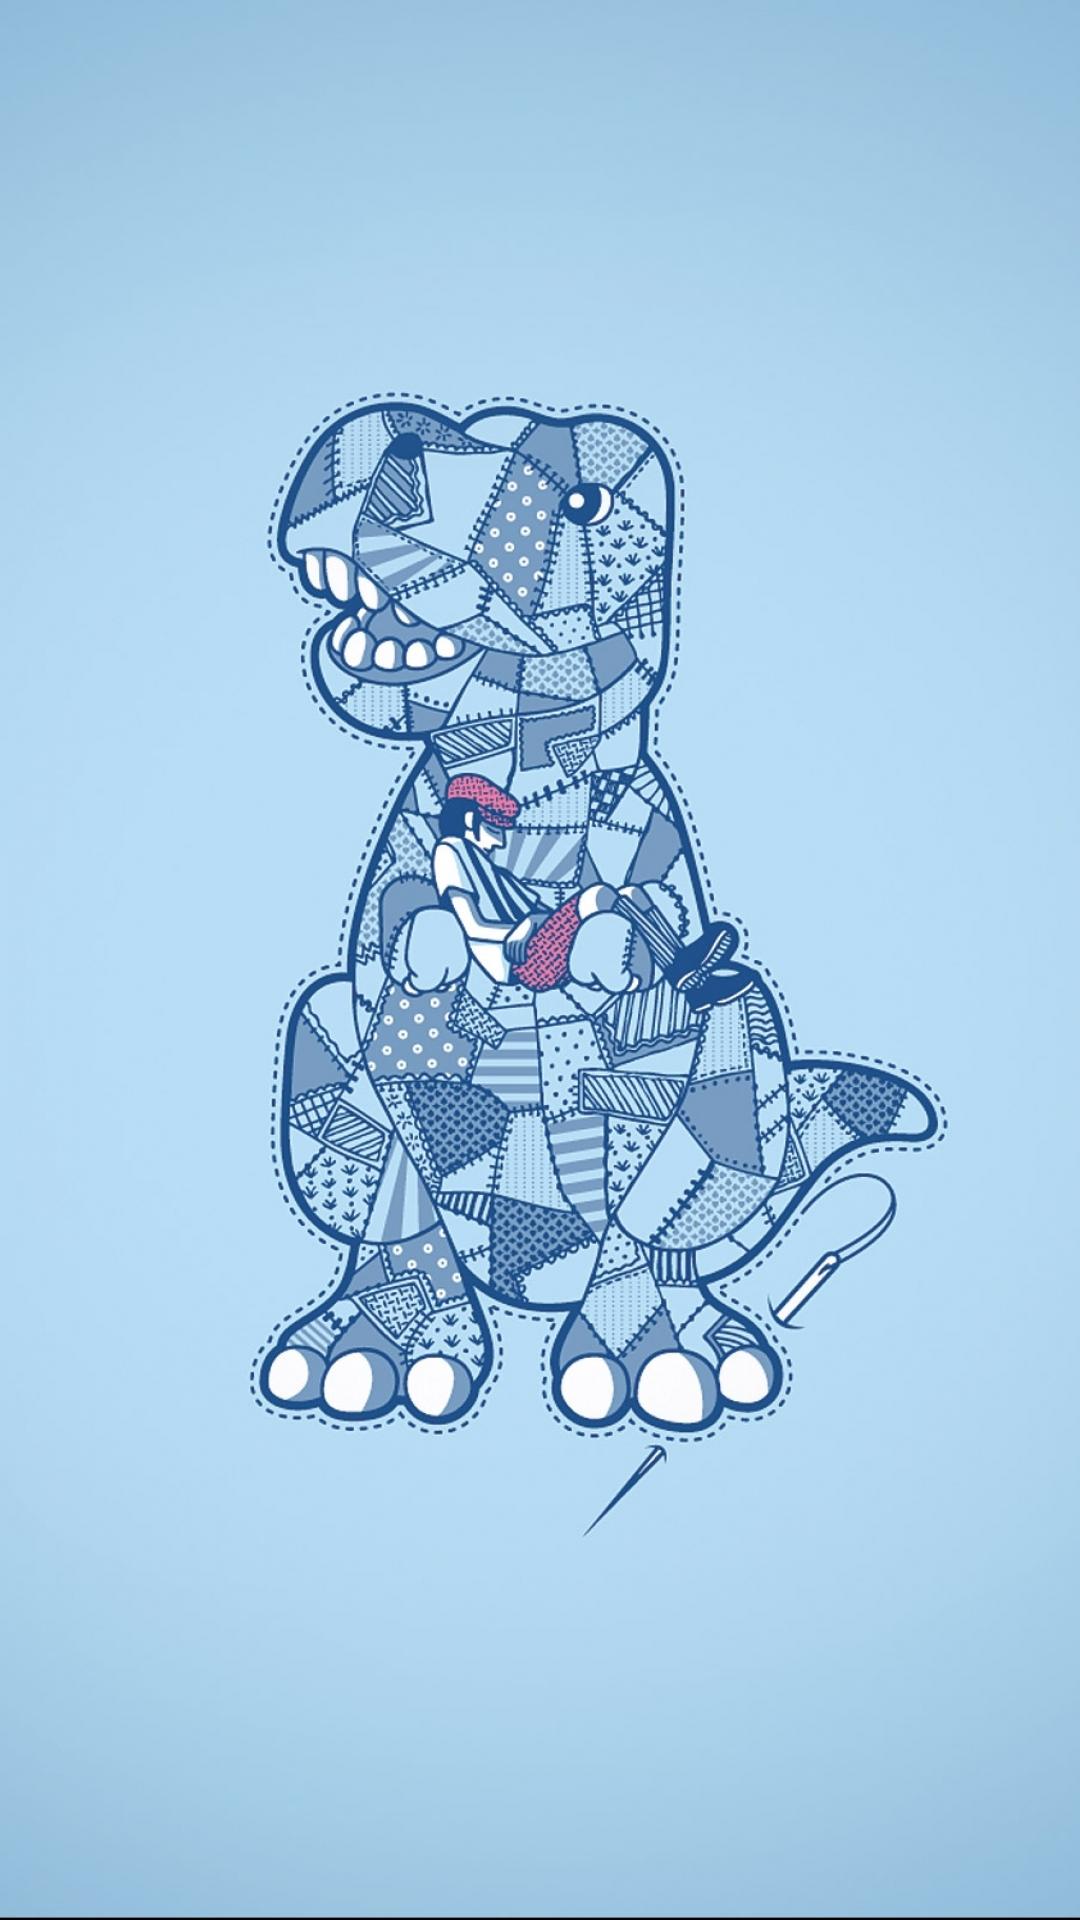 dinosaur phone wallpaper - photo #33